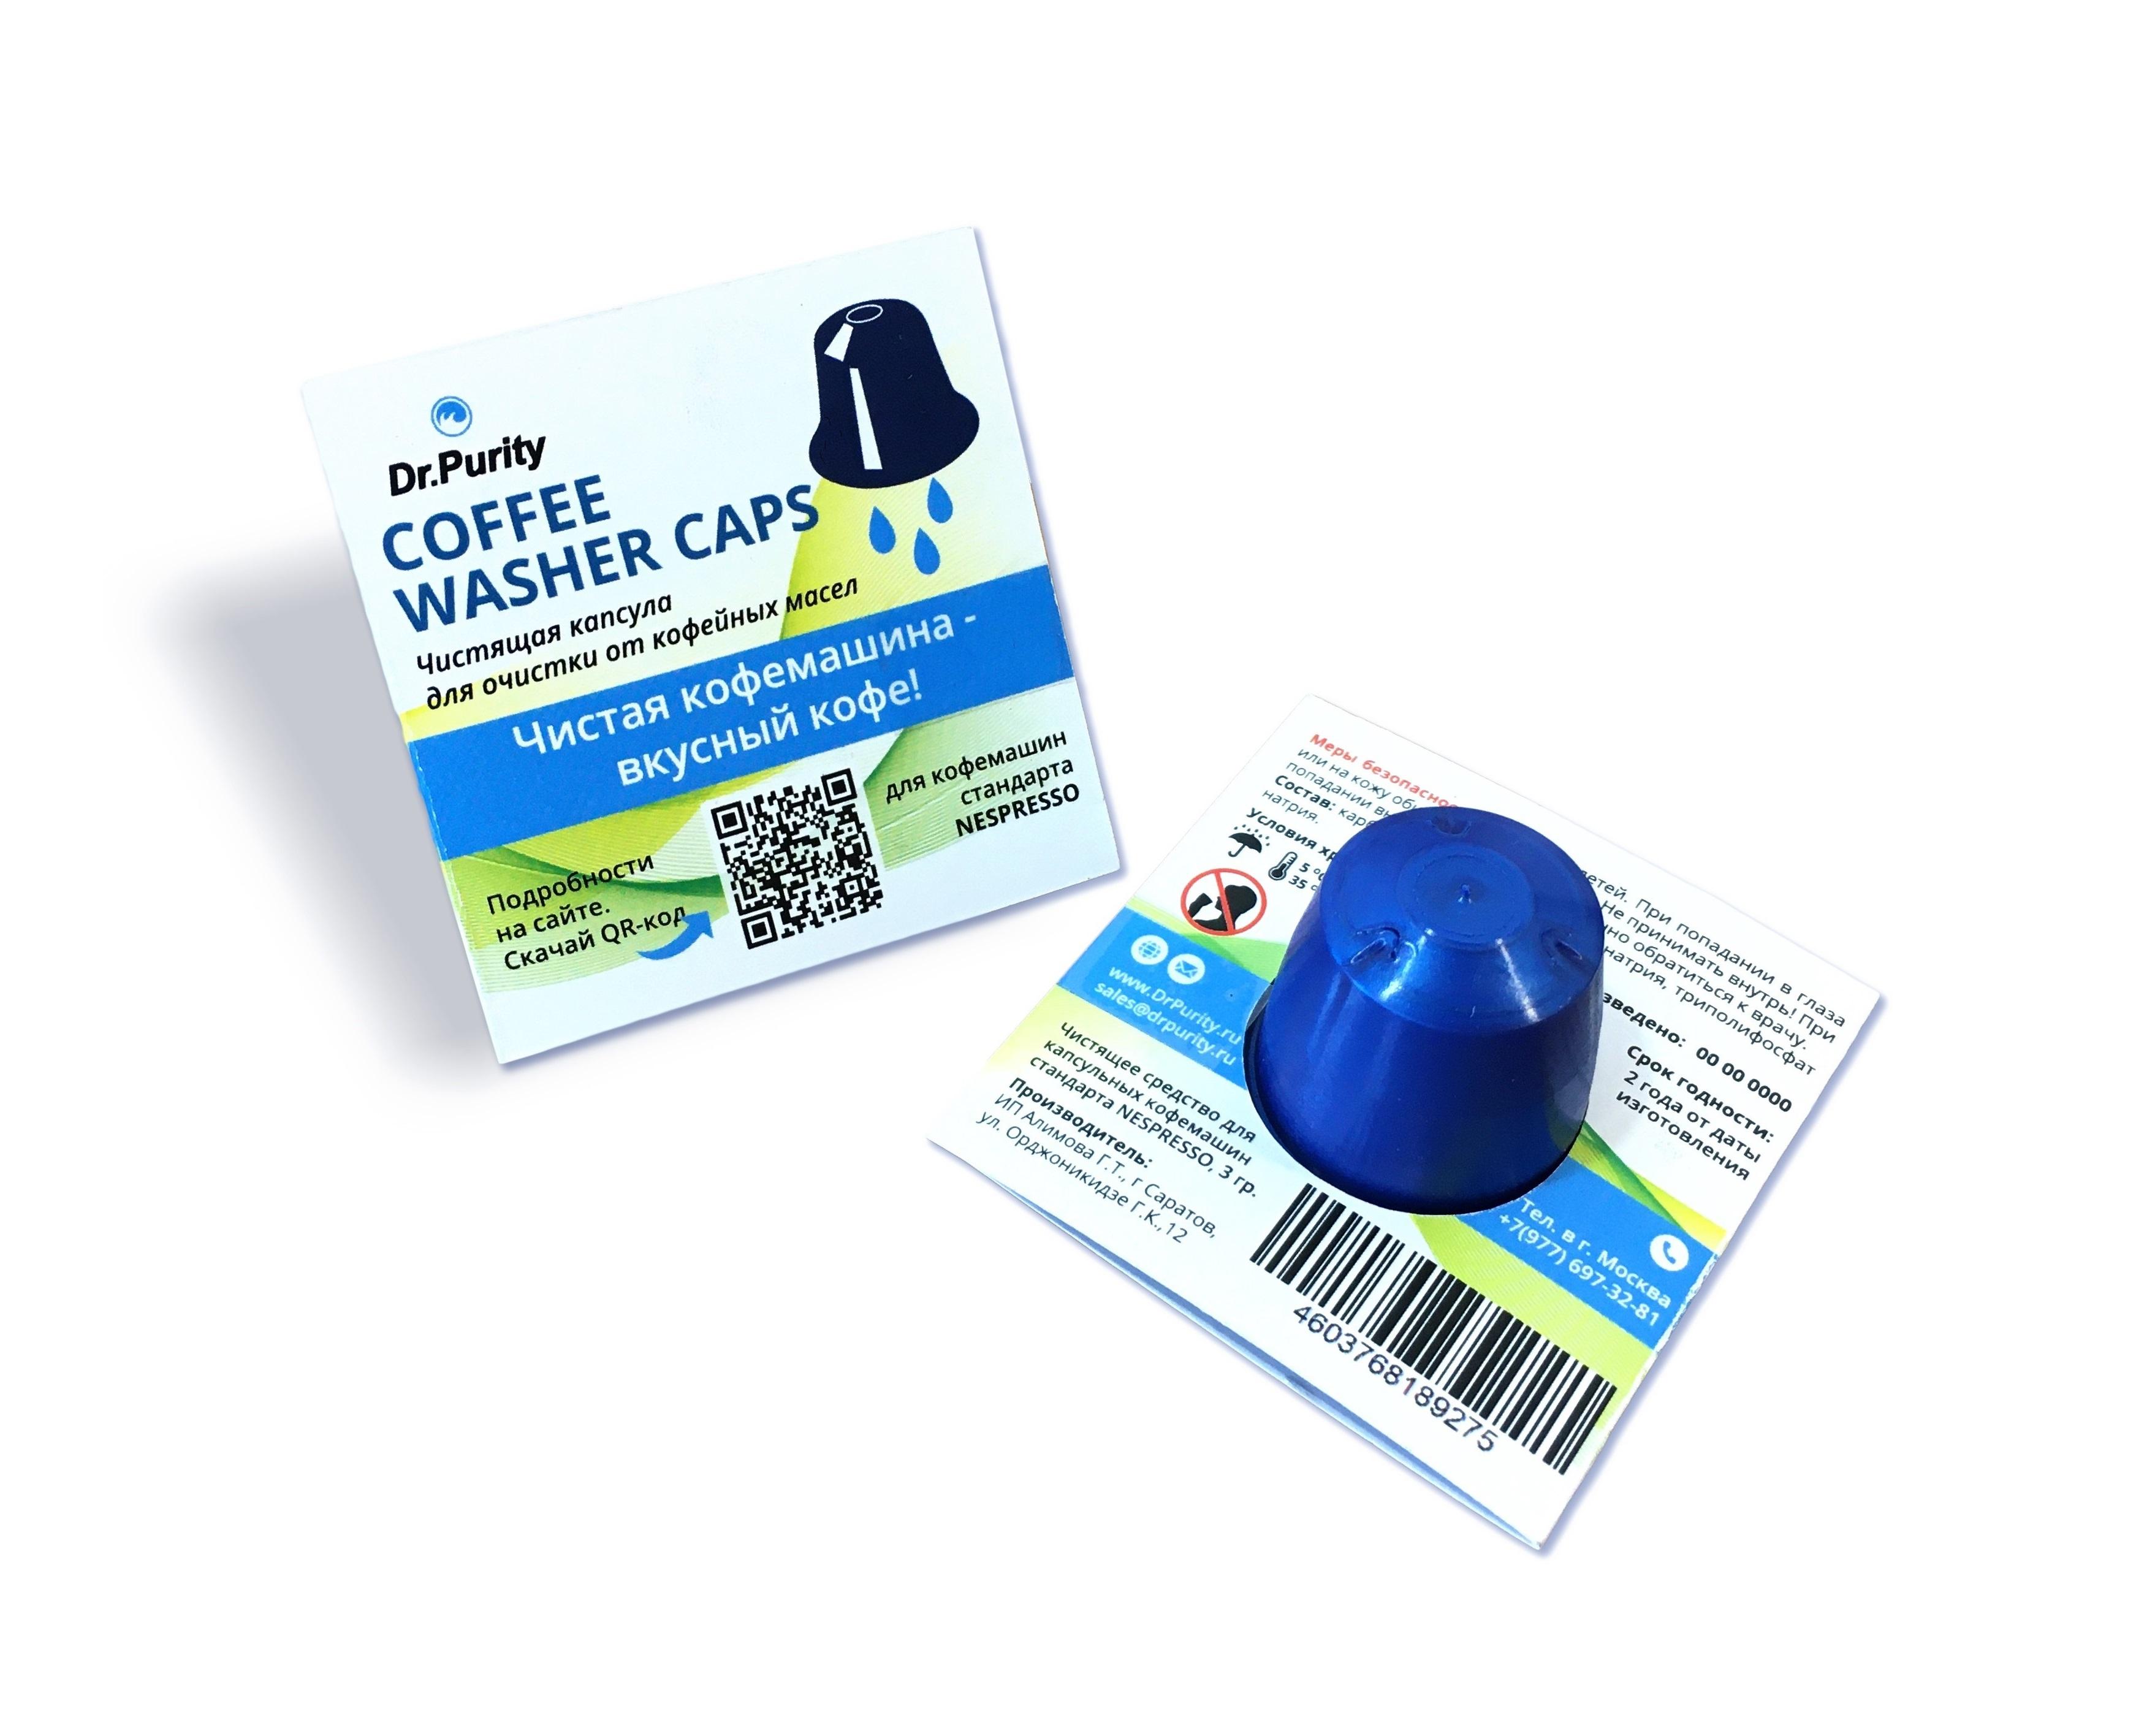 Чистящая капсула для кофемашин стандарта Неспрессо DrPurity Coffee Washer Caps 1 шт